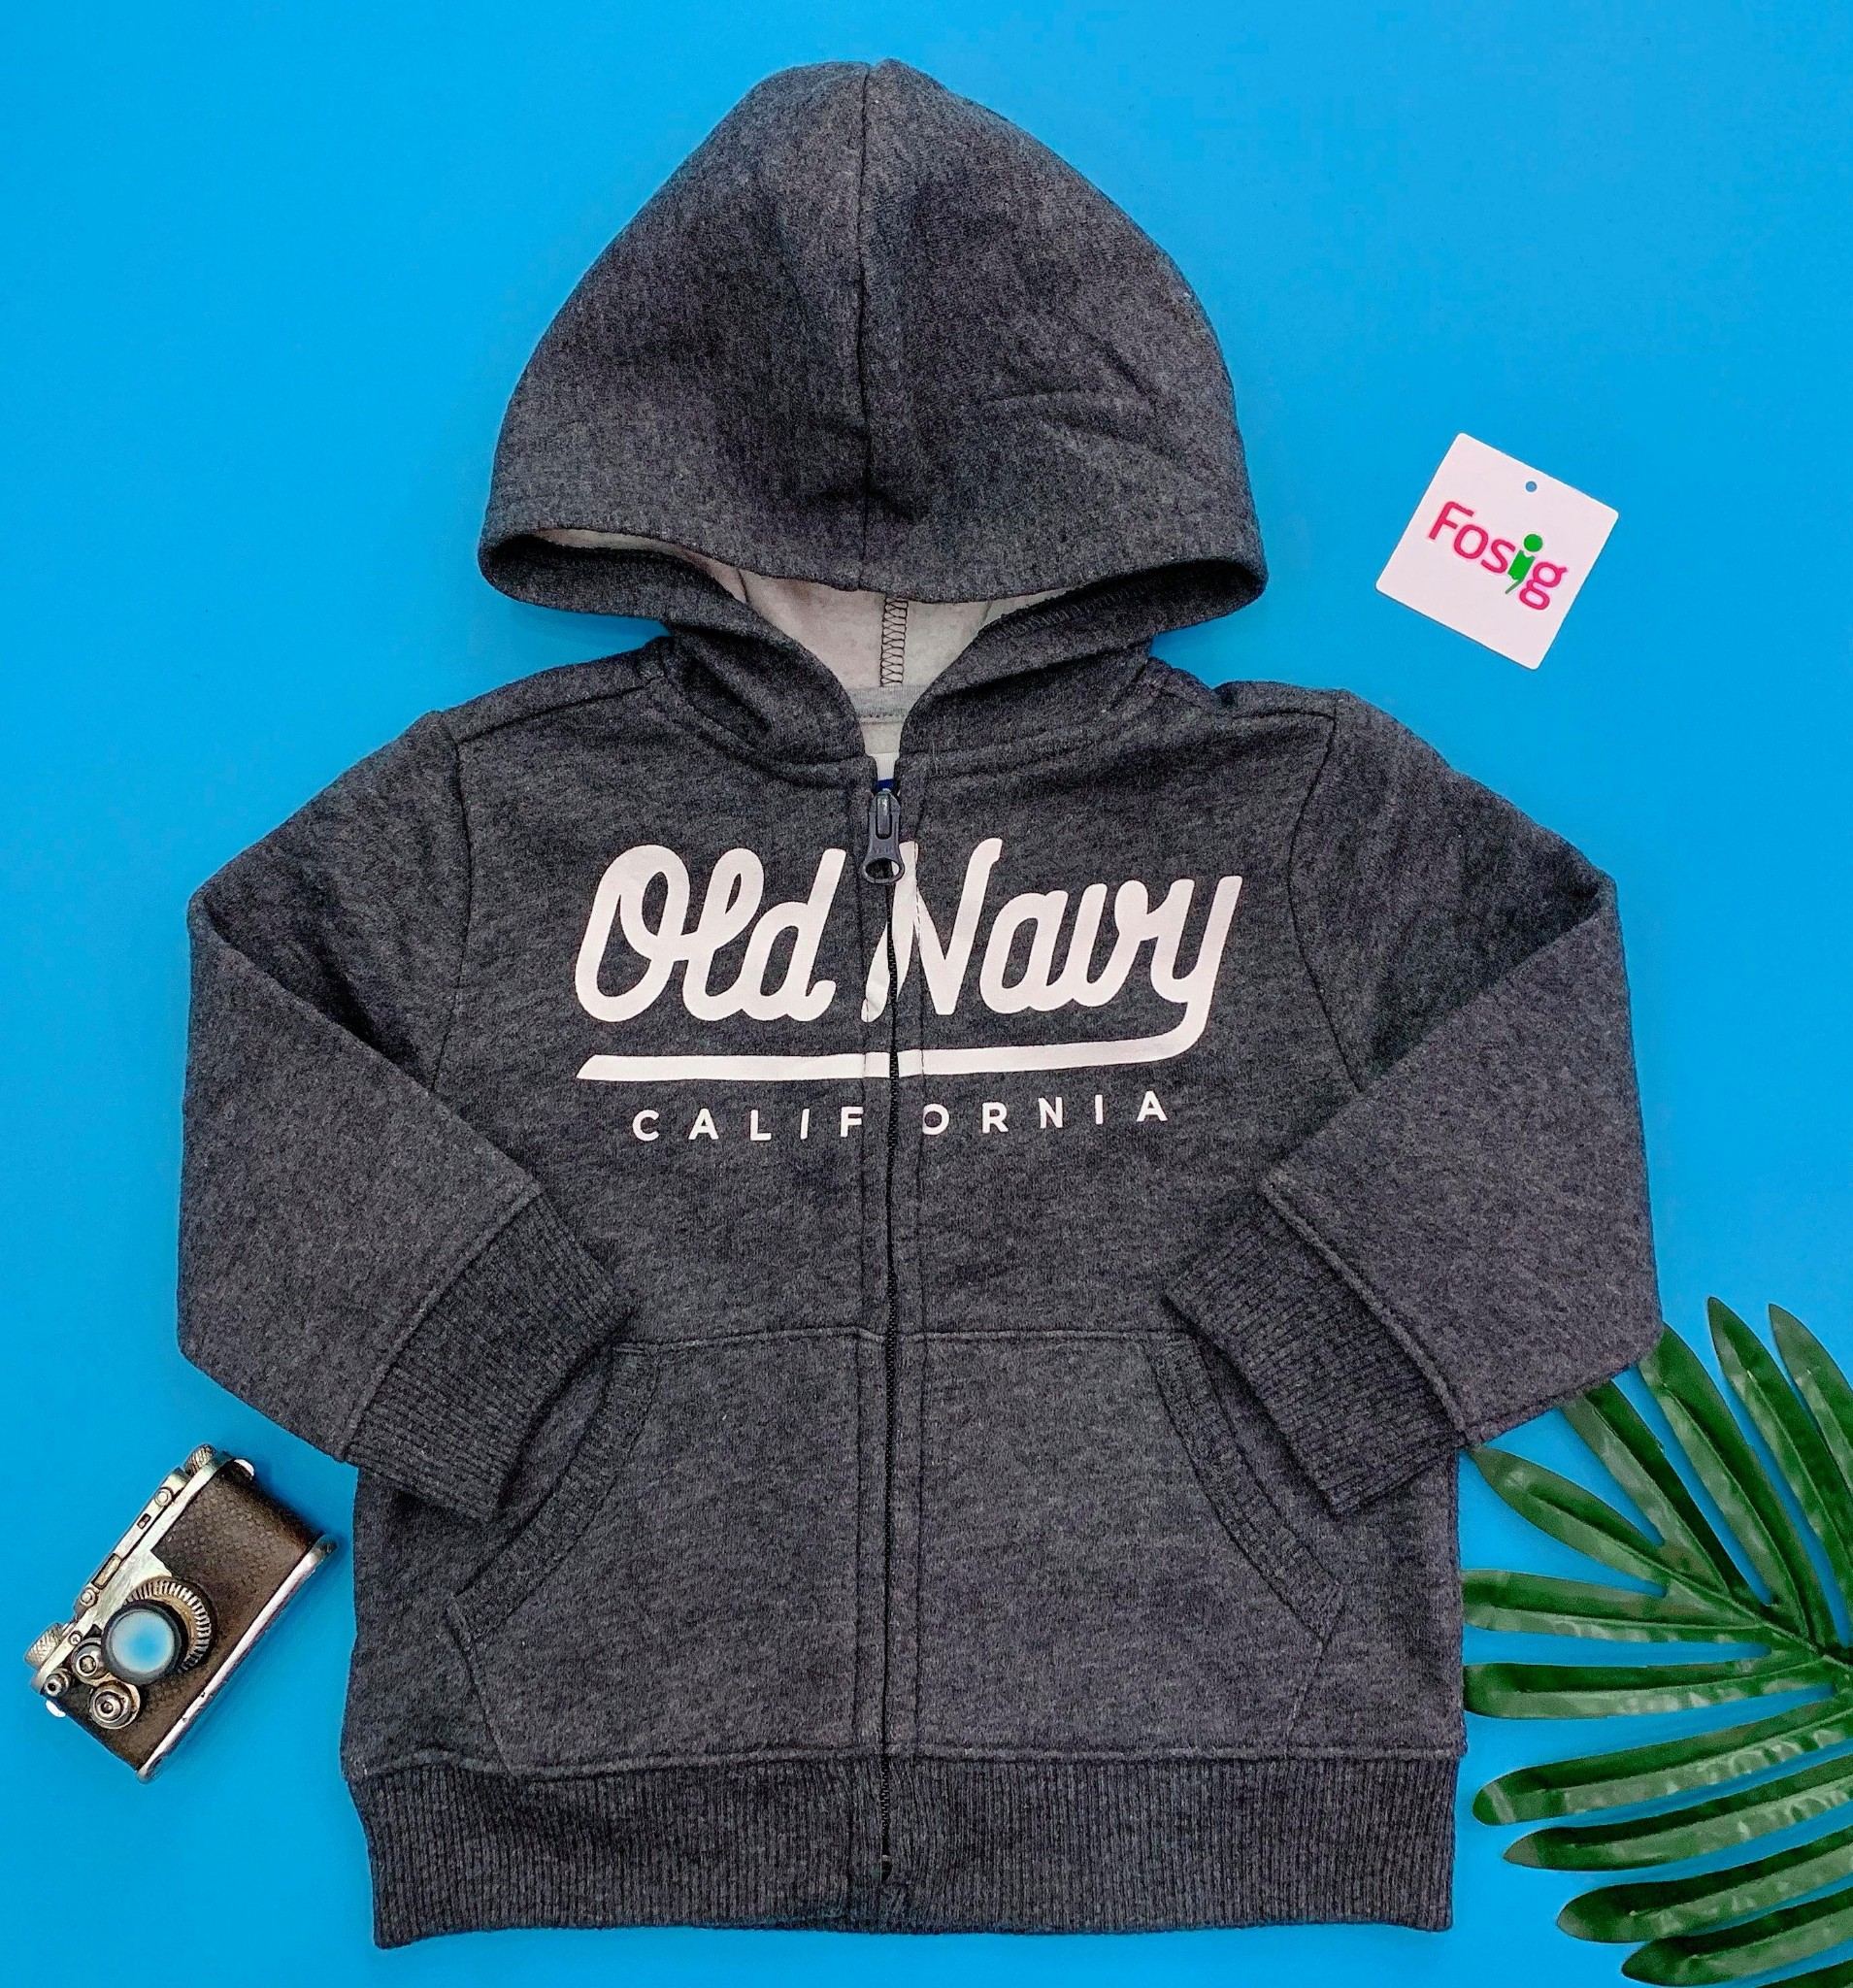 [9-17kg] Áo Khoác Old Navy [Boy] - Xám Đen/Old Navy